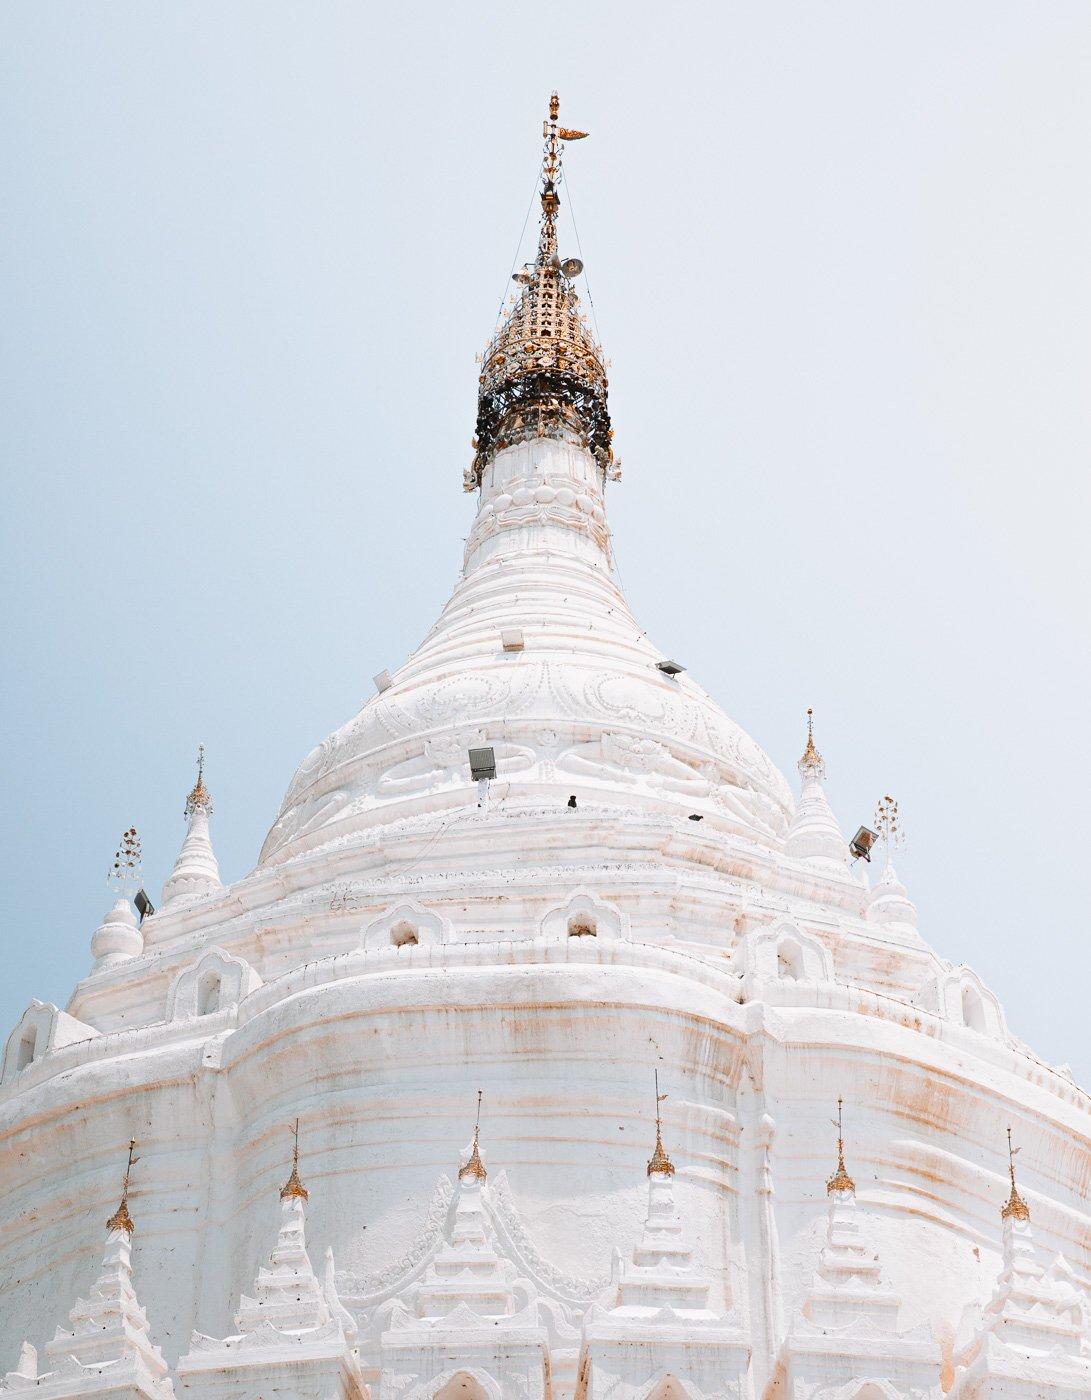 BEST THINGS TO DO IN MINGUN, MANDALAY, Hsinbyume Pagoda